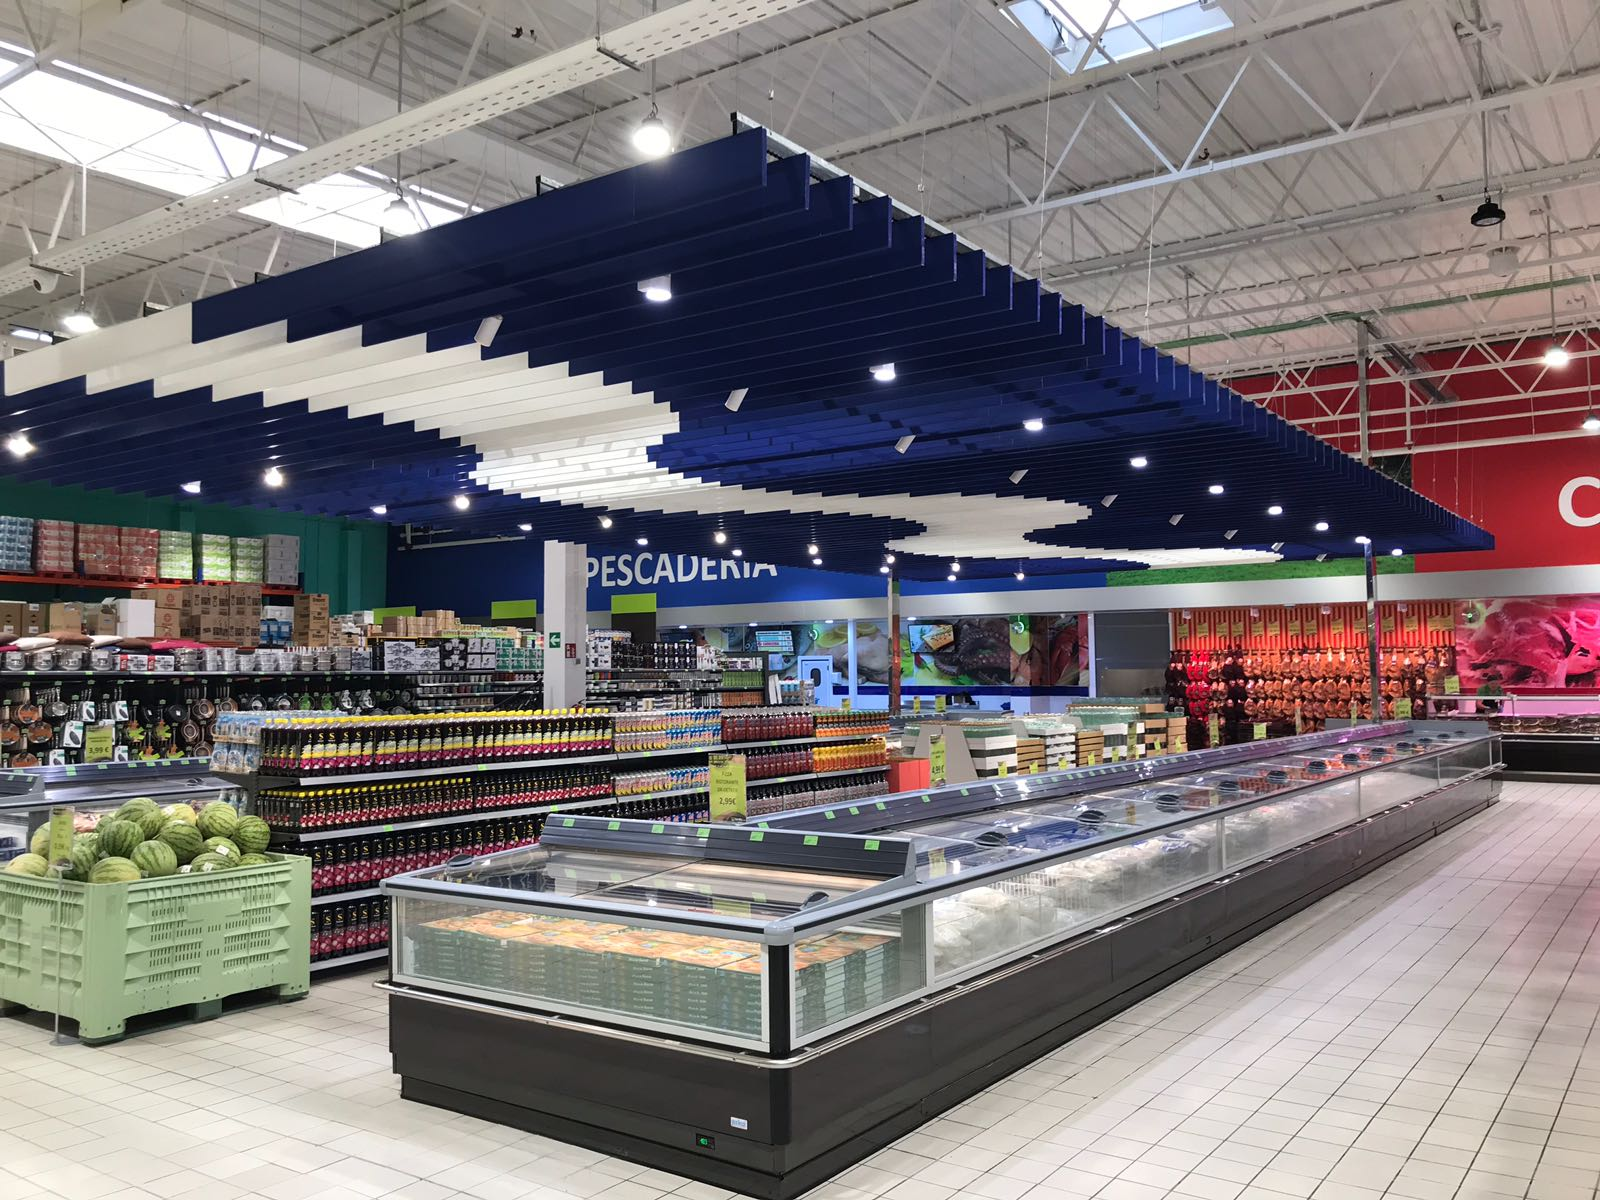 Family Cash inaugura su nueva tienda en Vinaròs